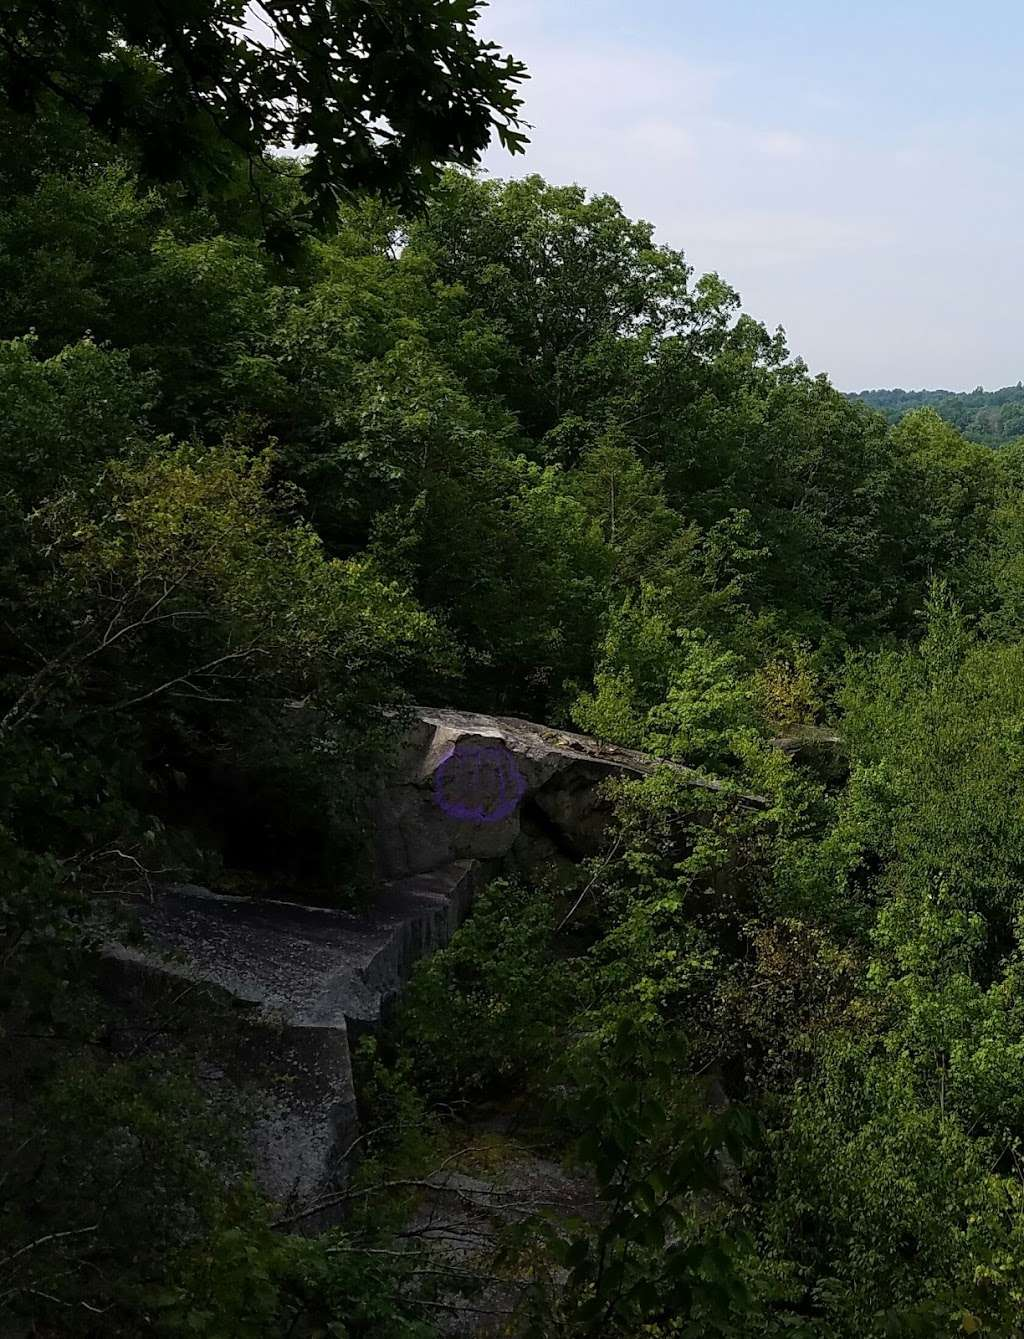 Sylvan Glen Nature Preserve - park  | Photo 10 of 10 | Address: Hunterbrook Rd, Mohegan Lake, NY 10547, USA | Phone: (914) 245-4650